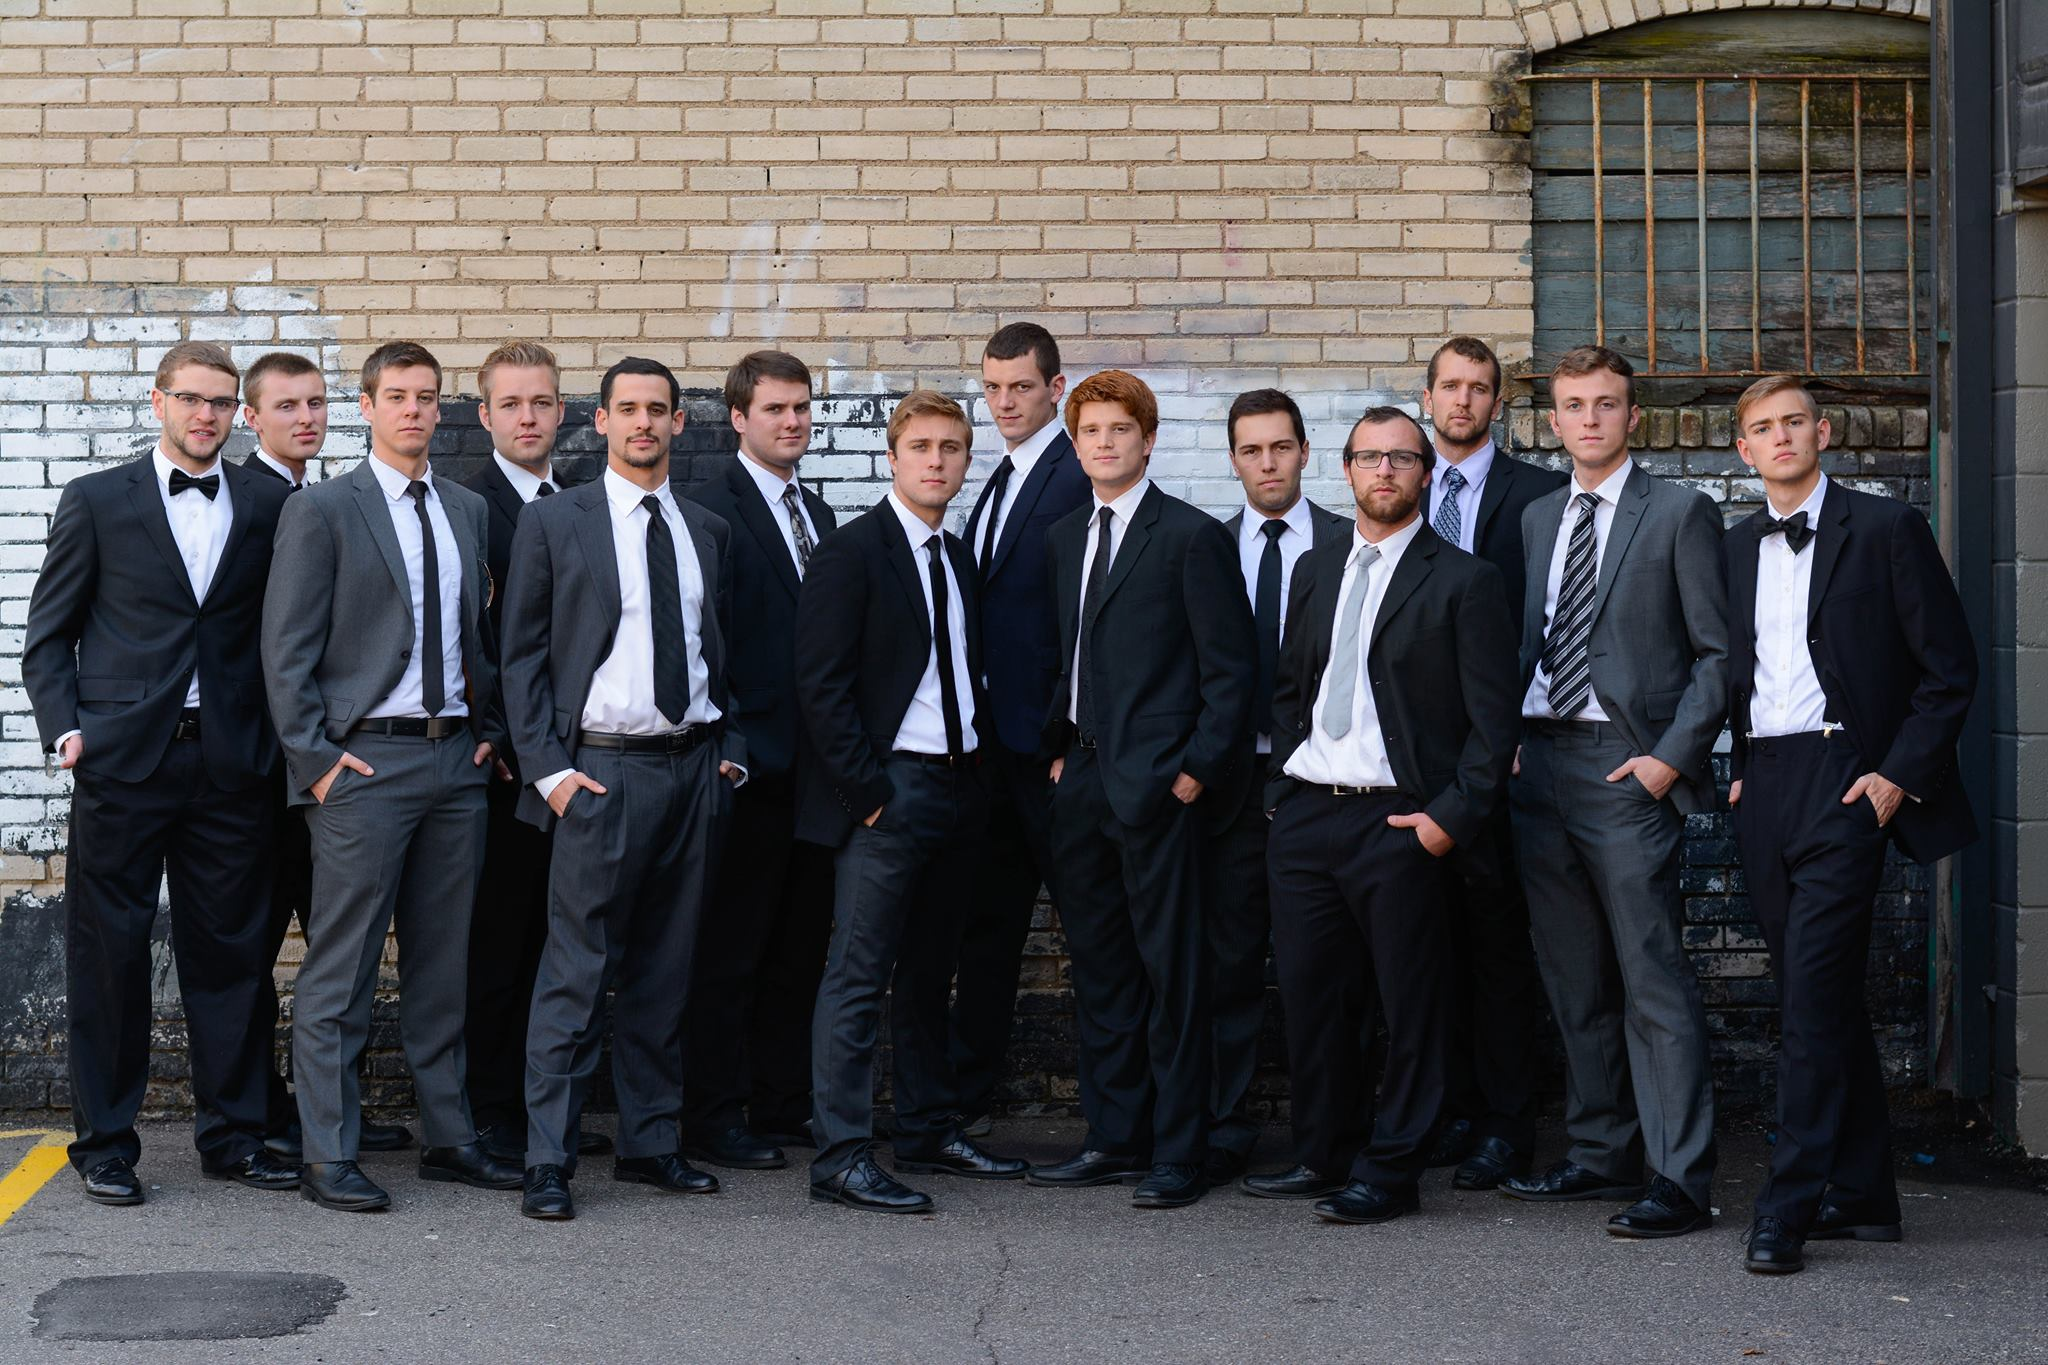 The men of SPO at the University of Minnesota